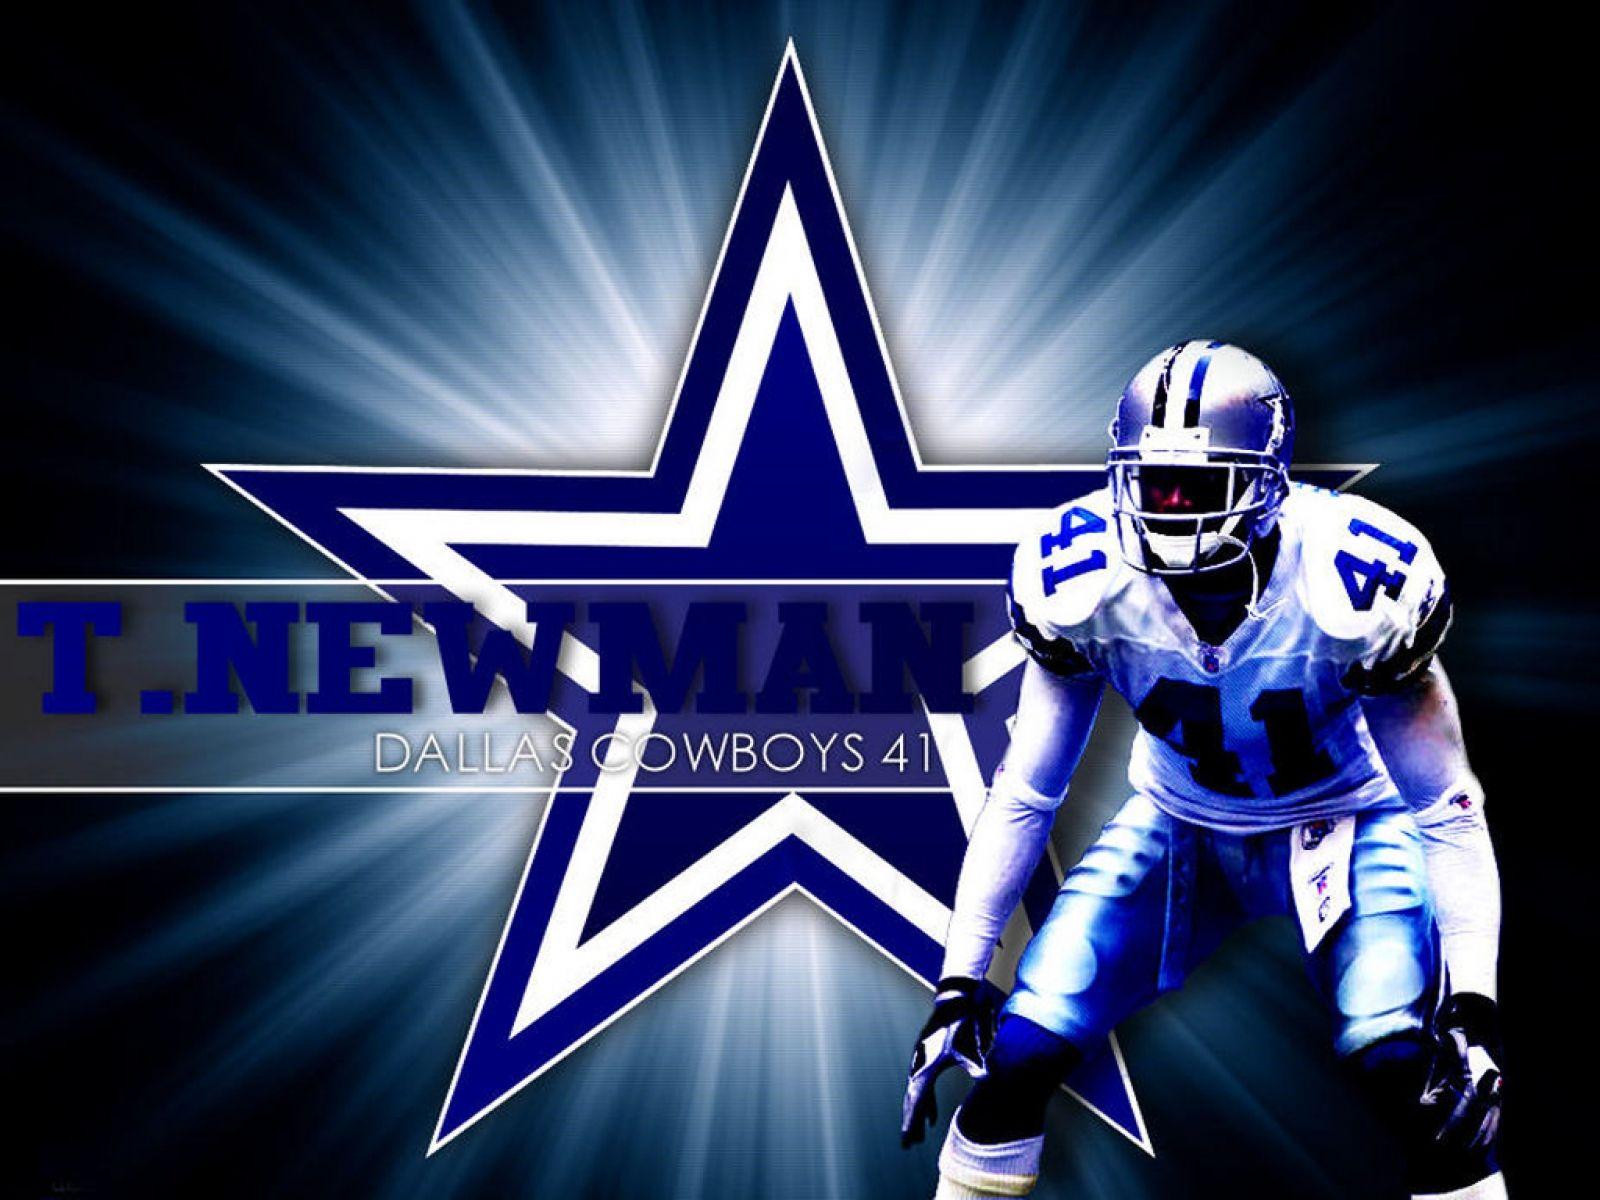 Dallas Cowboys wallpaper images Dallas Cowboys wallpapers 1600x1200